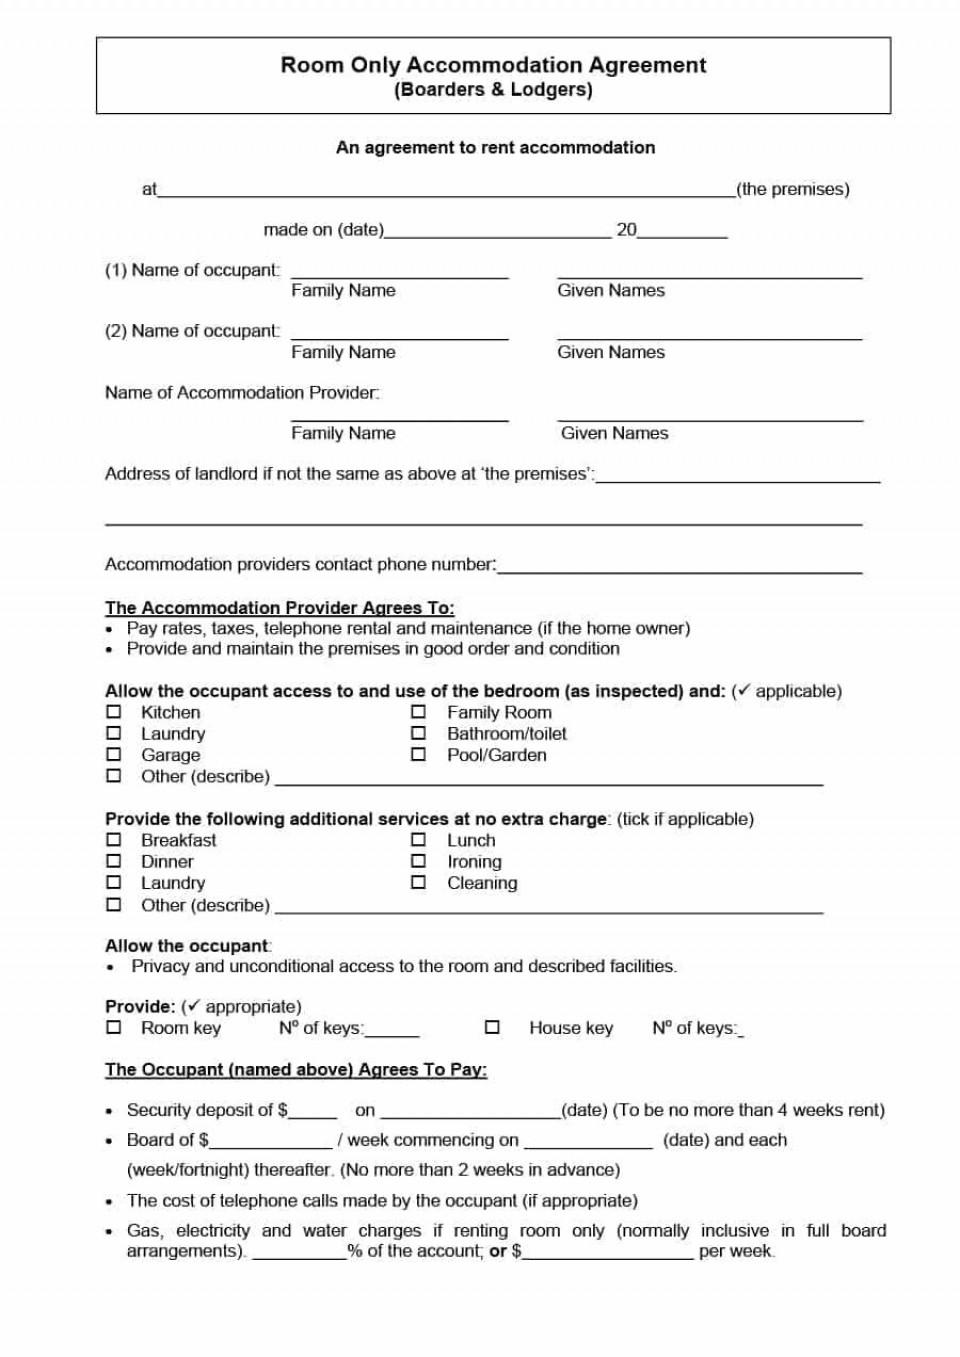 003 Sensational Generic Room Rental Agreement Free Inspiration  Printable960